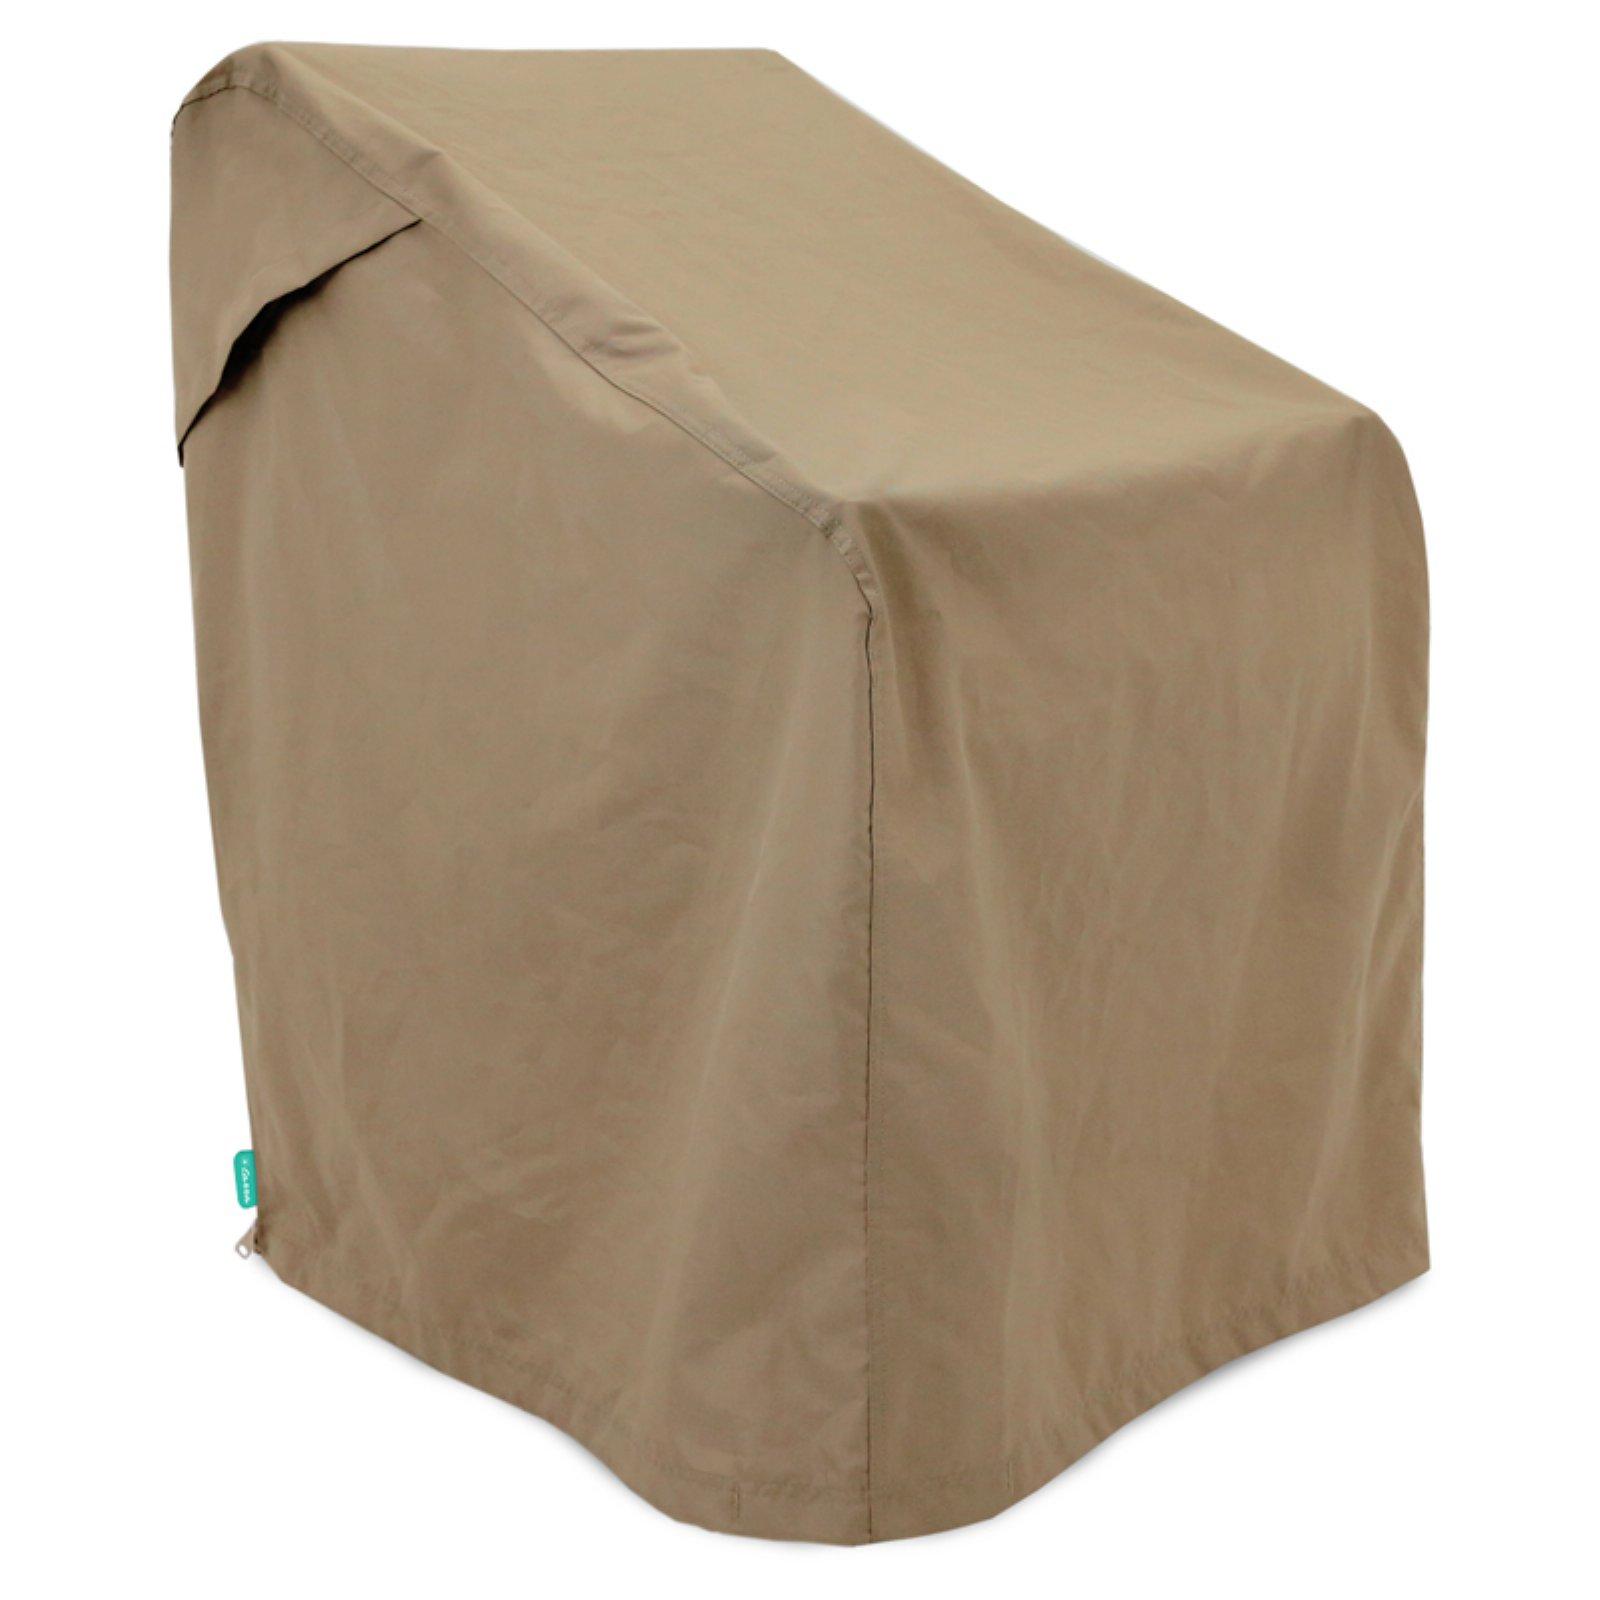 Tarra Home Universal Outdoor UFCCP273036PT Patio Chair Cover